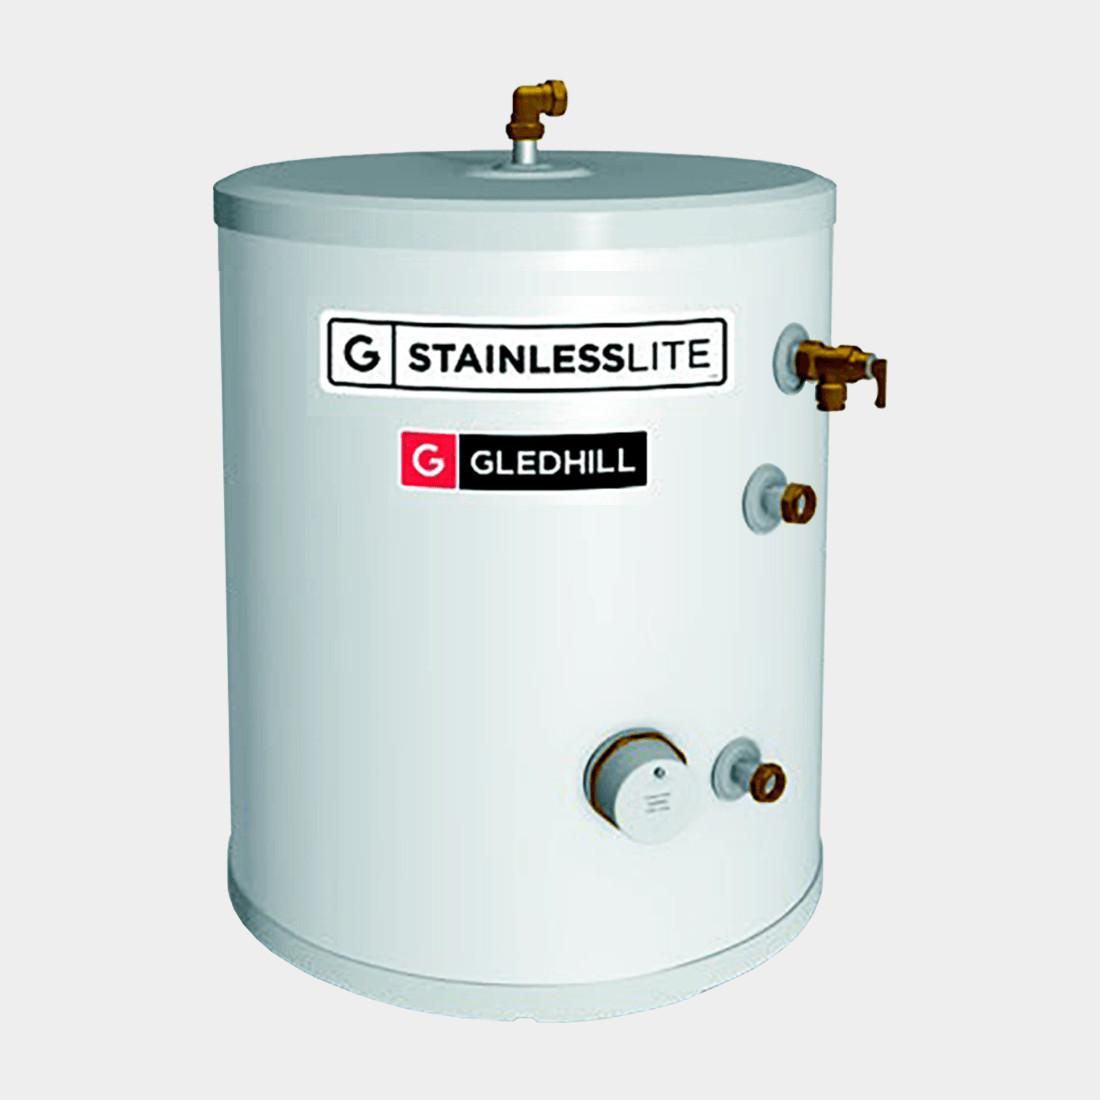 SH002 Gledhill Stainless Lite Immersion Heater